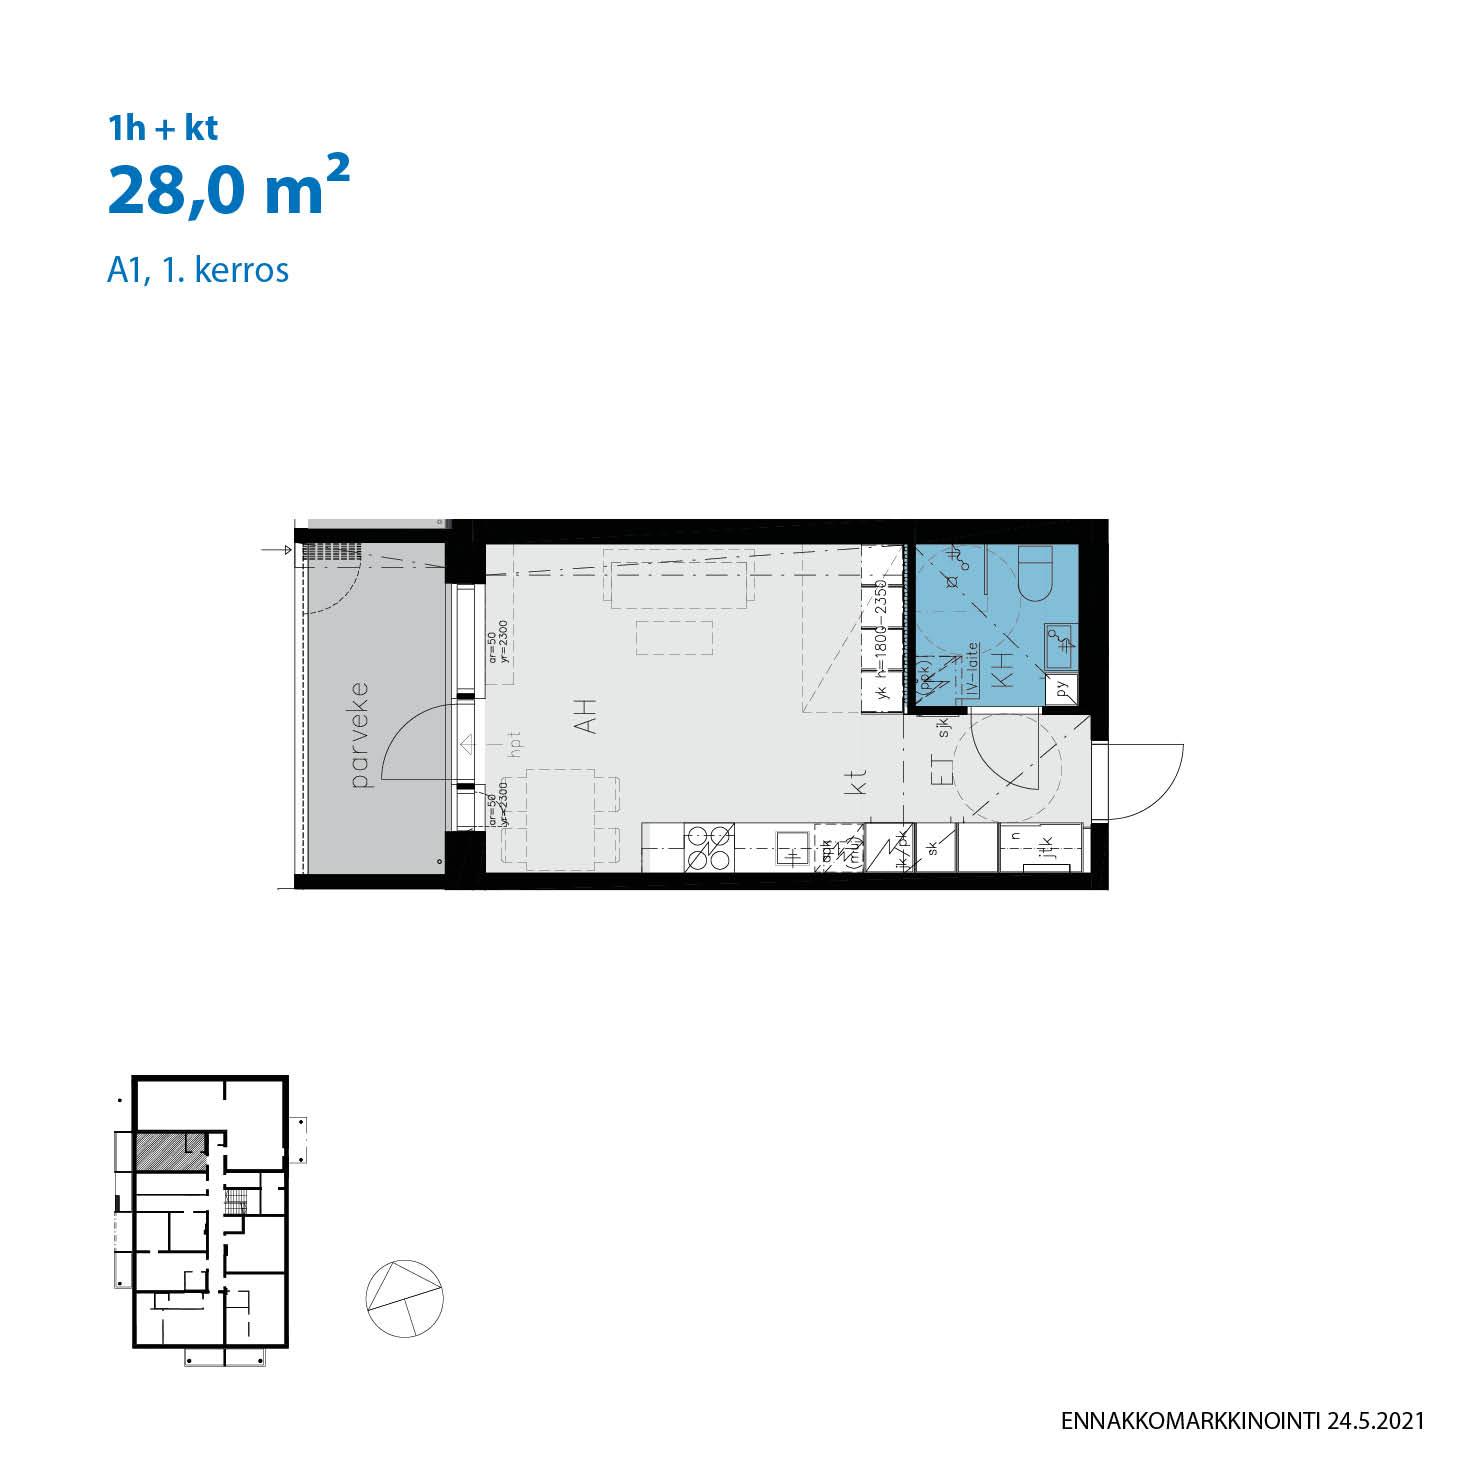 A1, 28.0 m<sup>2</sup>, 1h+kt